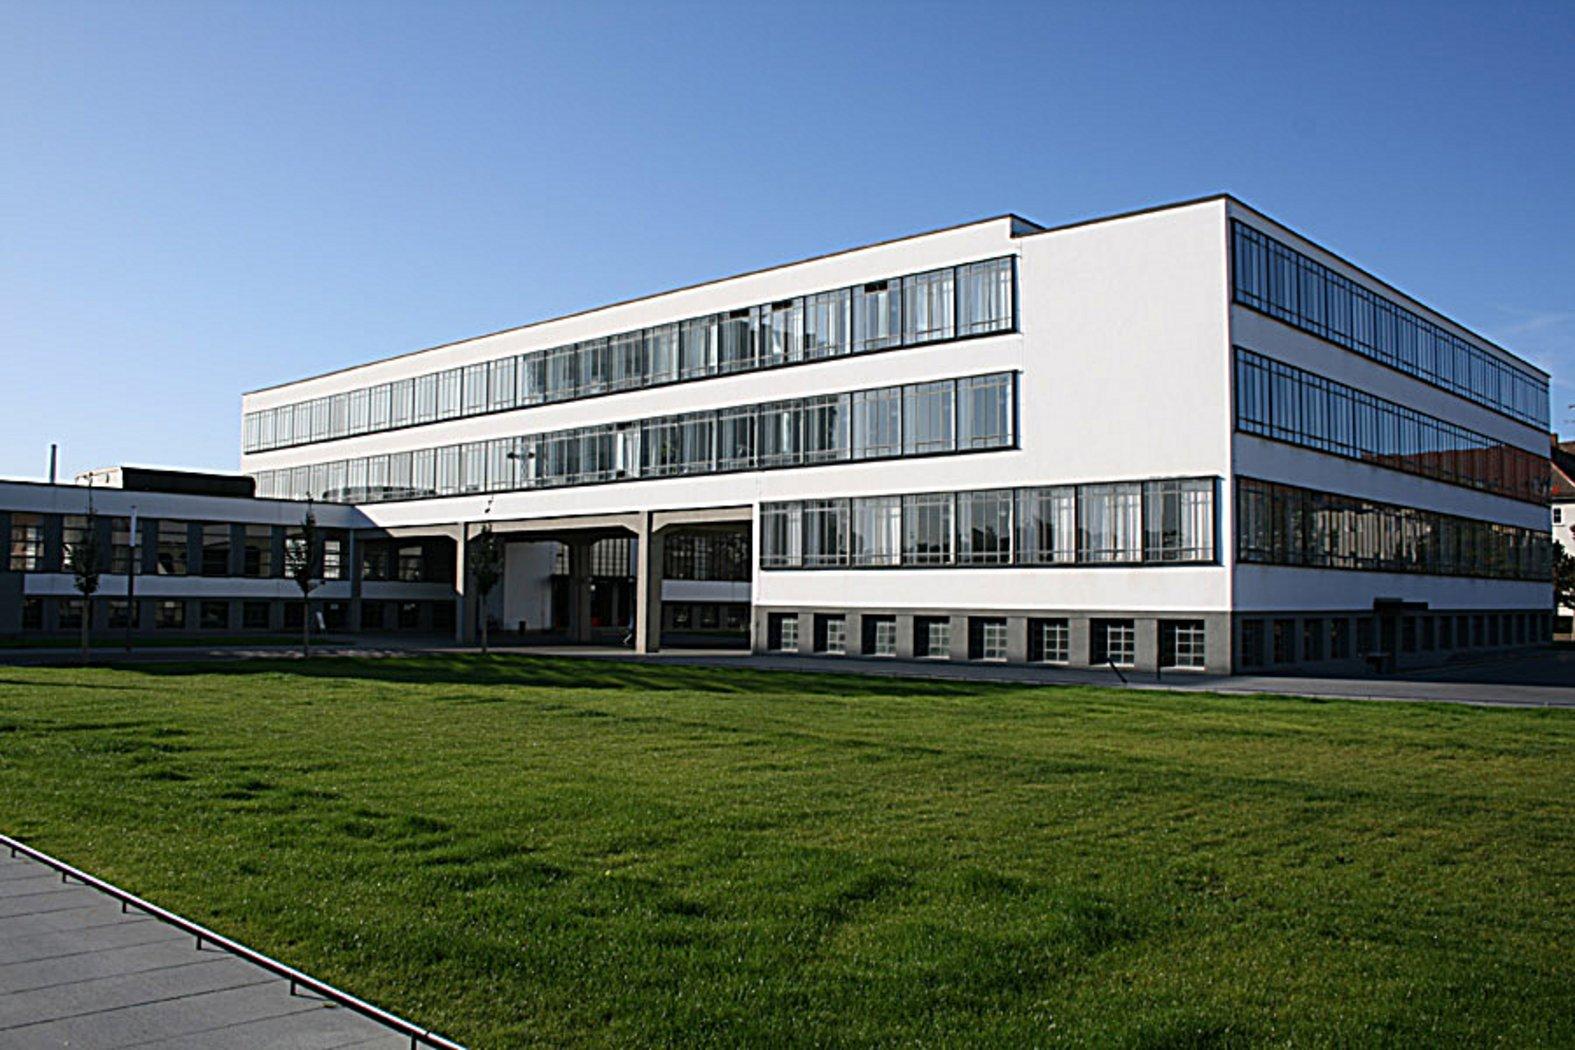 Bauhaus Building by Walter Gropius (1925–26) : Bauhaus Building